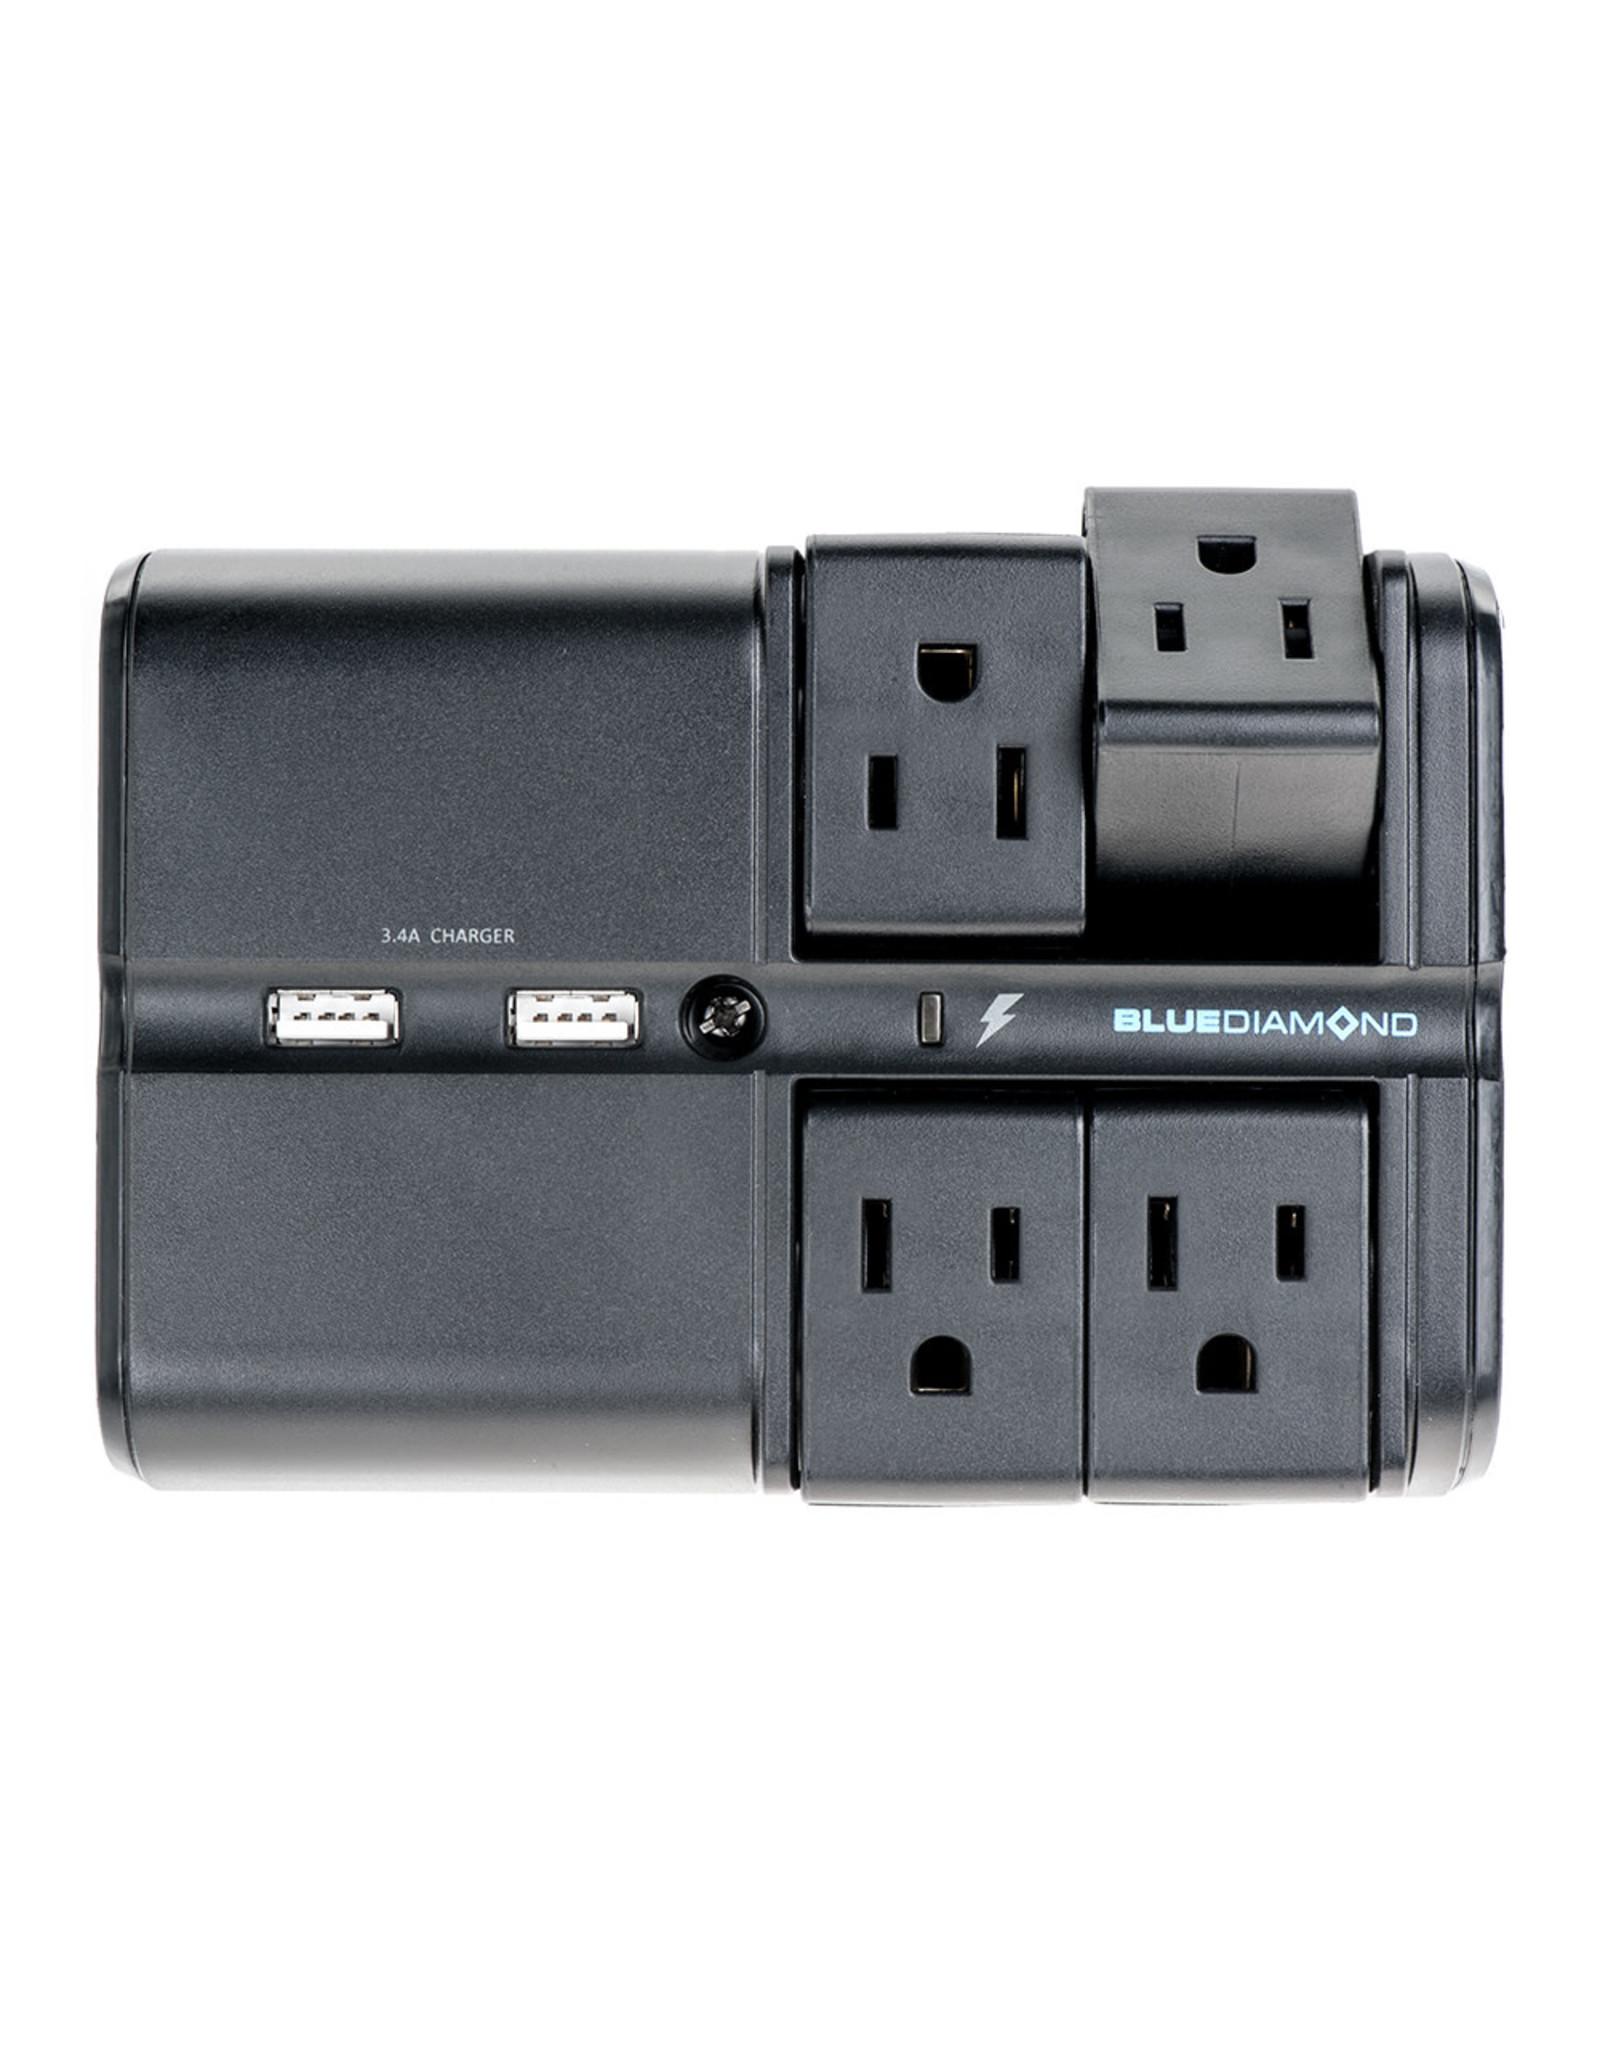 BlueDiamond BlueDiamond, Defend Flex + Charge, 4 Outlet Surge Protector + 2 USB Charging Ports